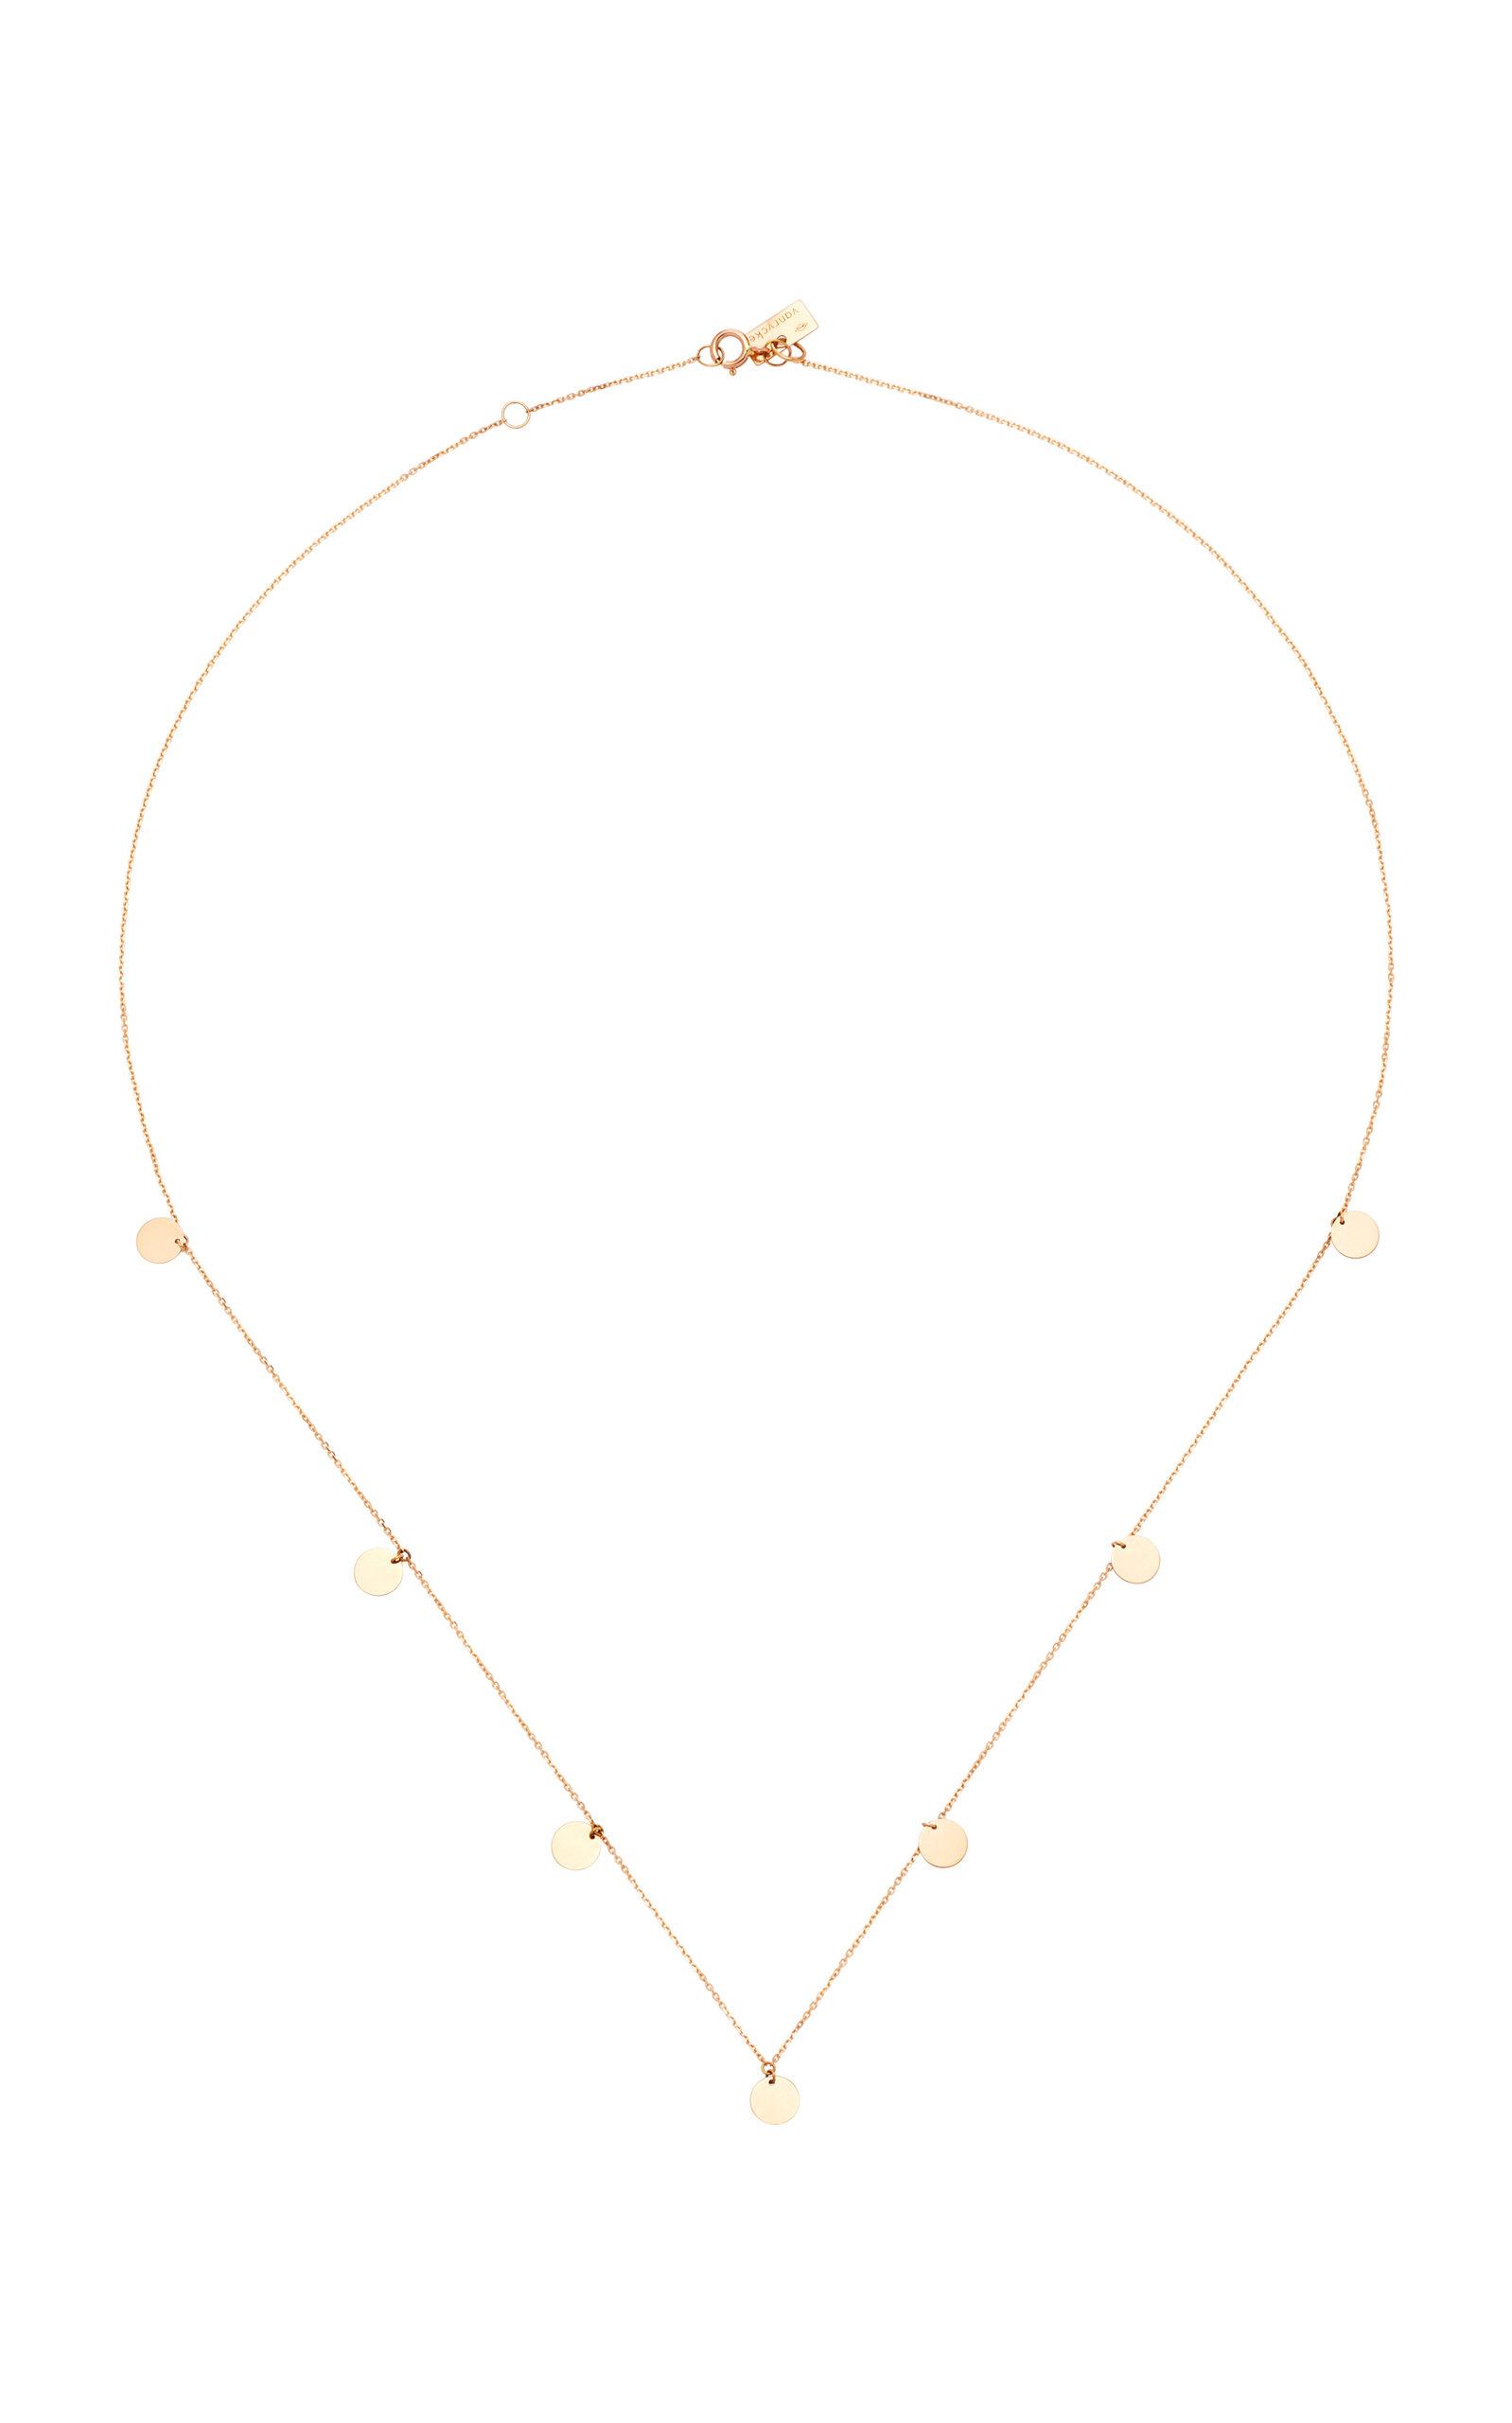 VANRYCKE Marrakech 18K Rose Gold Necklace